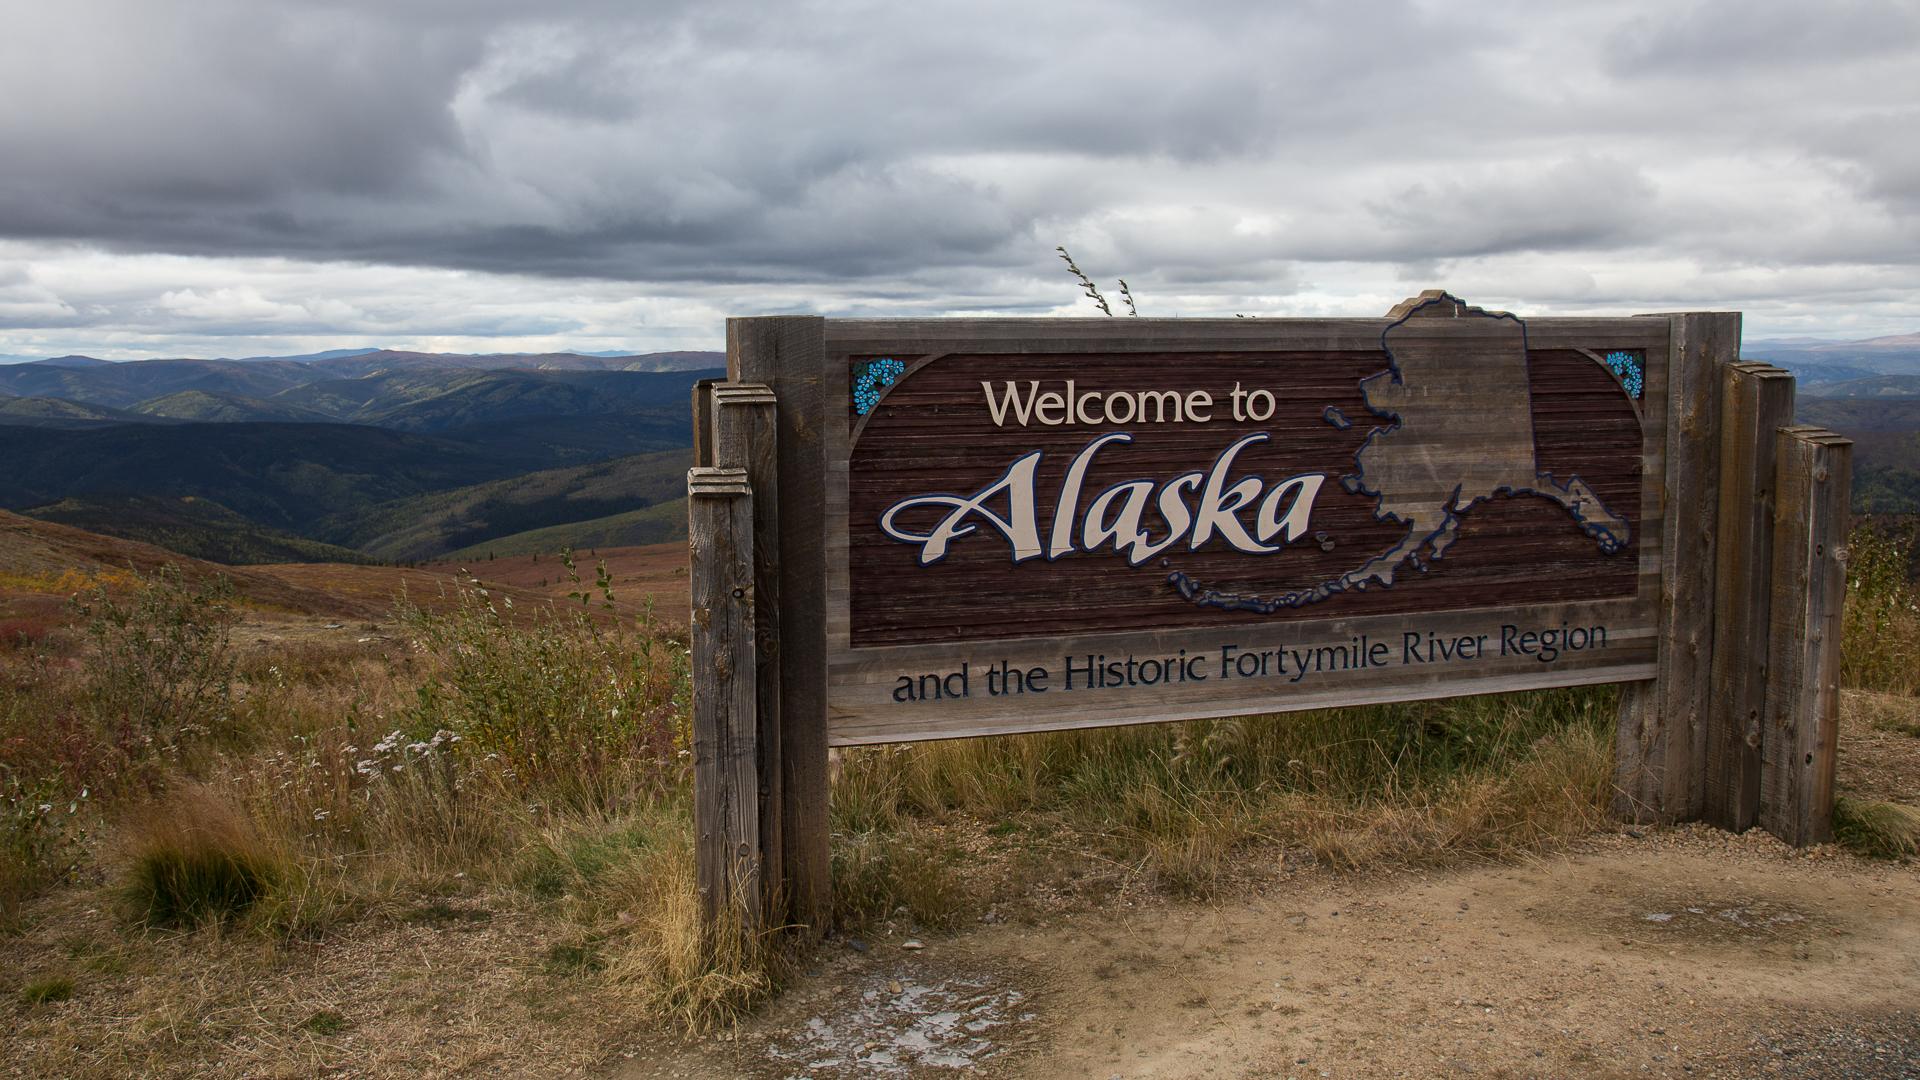 Leaving Alaska, back into the Yukon